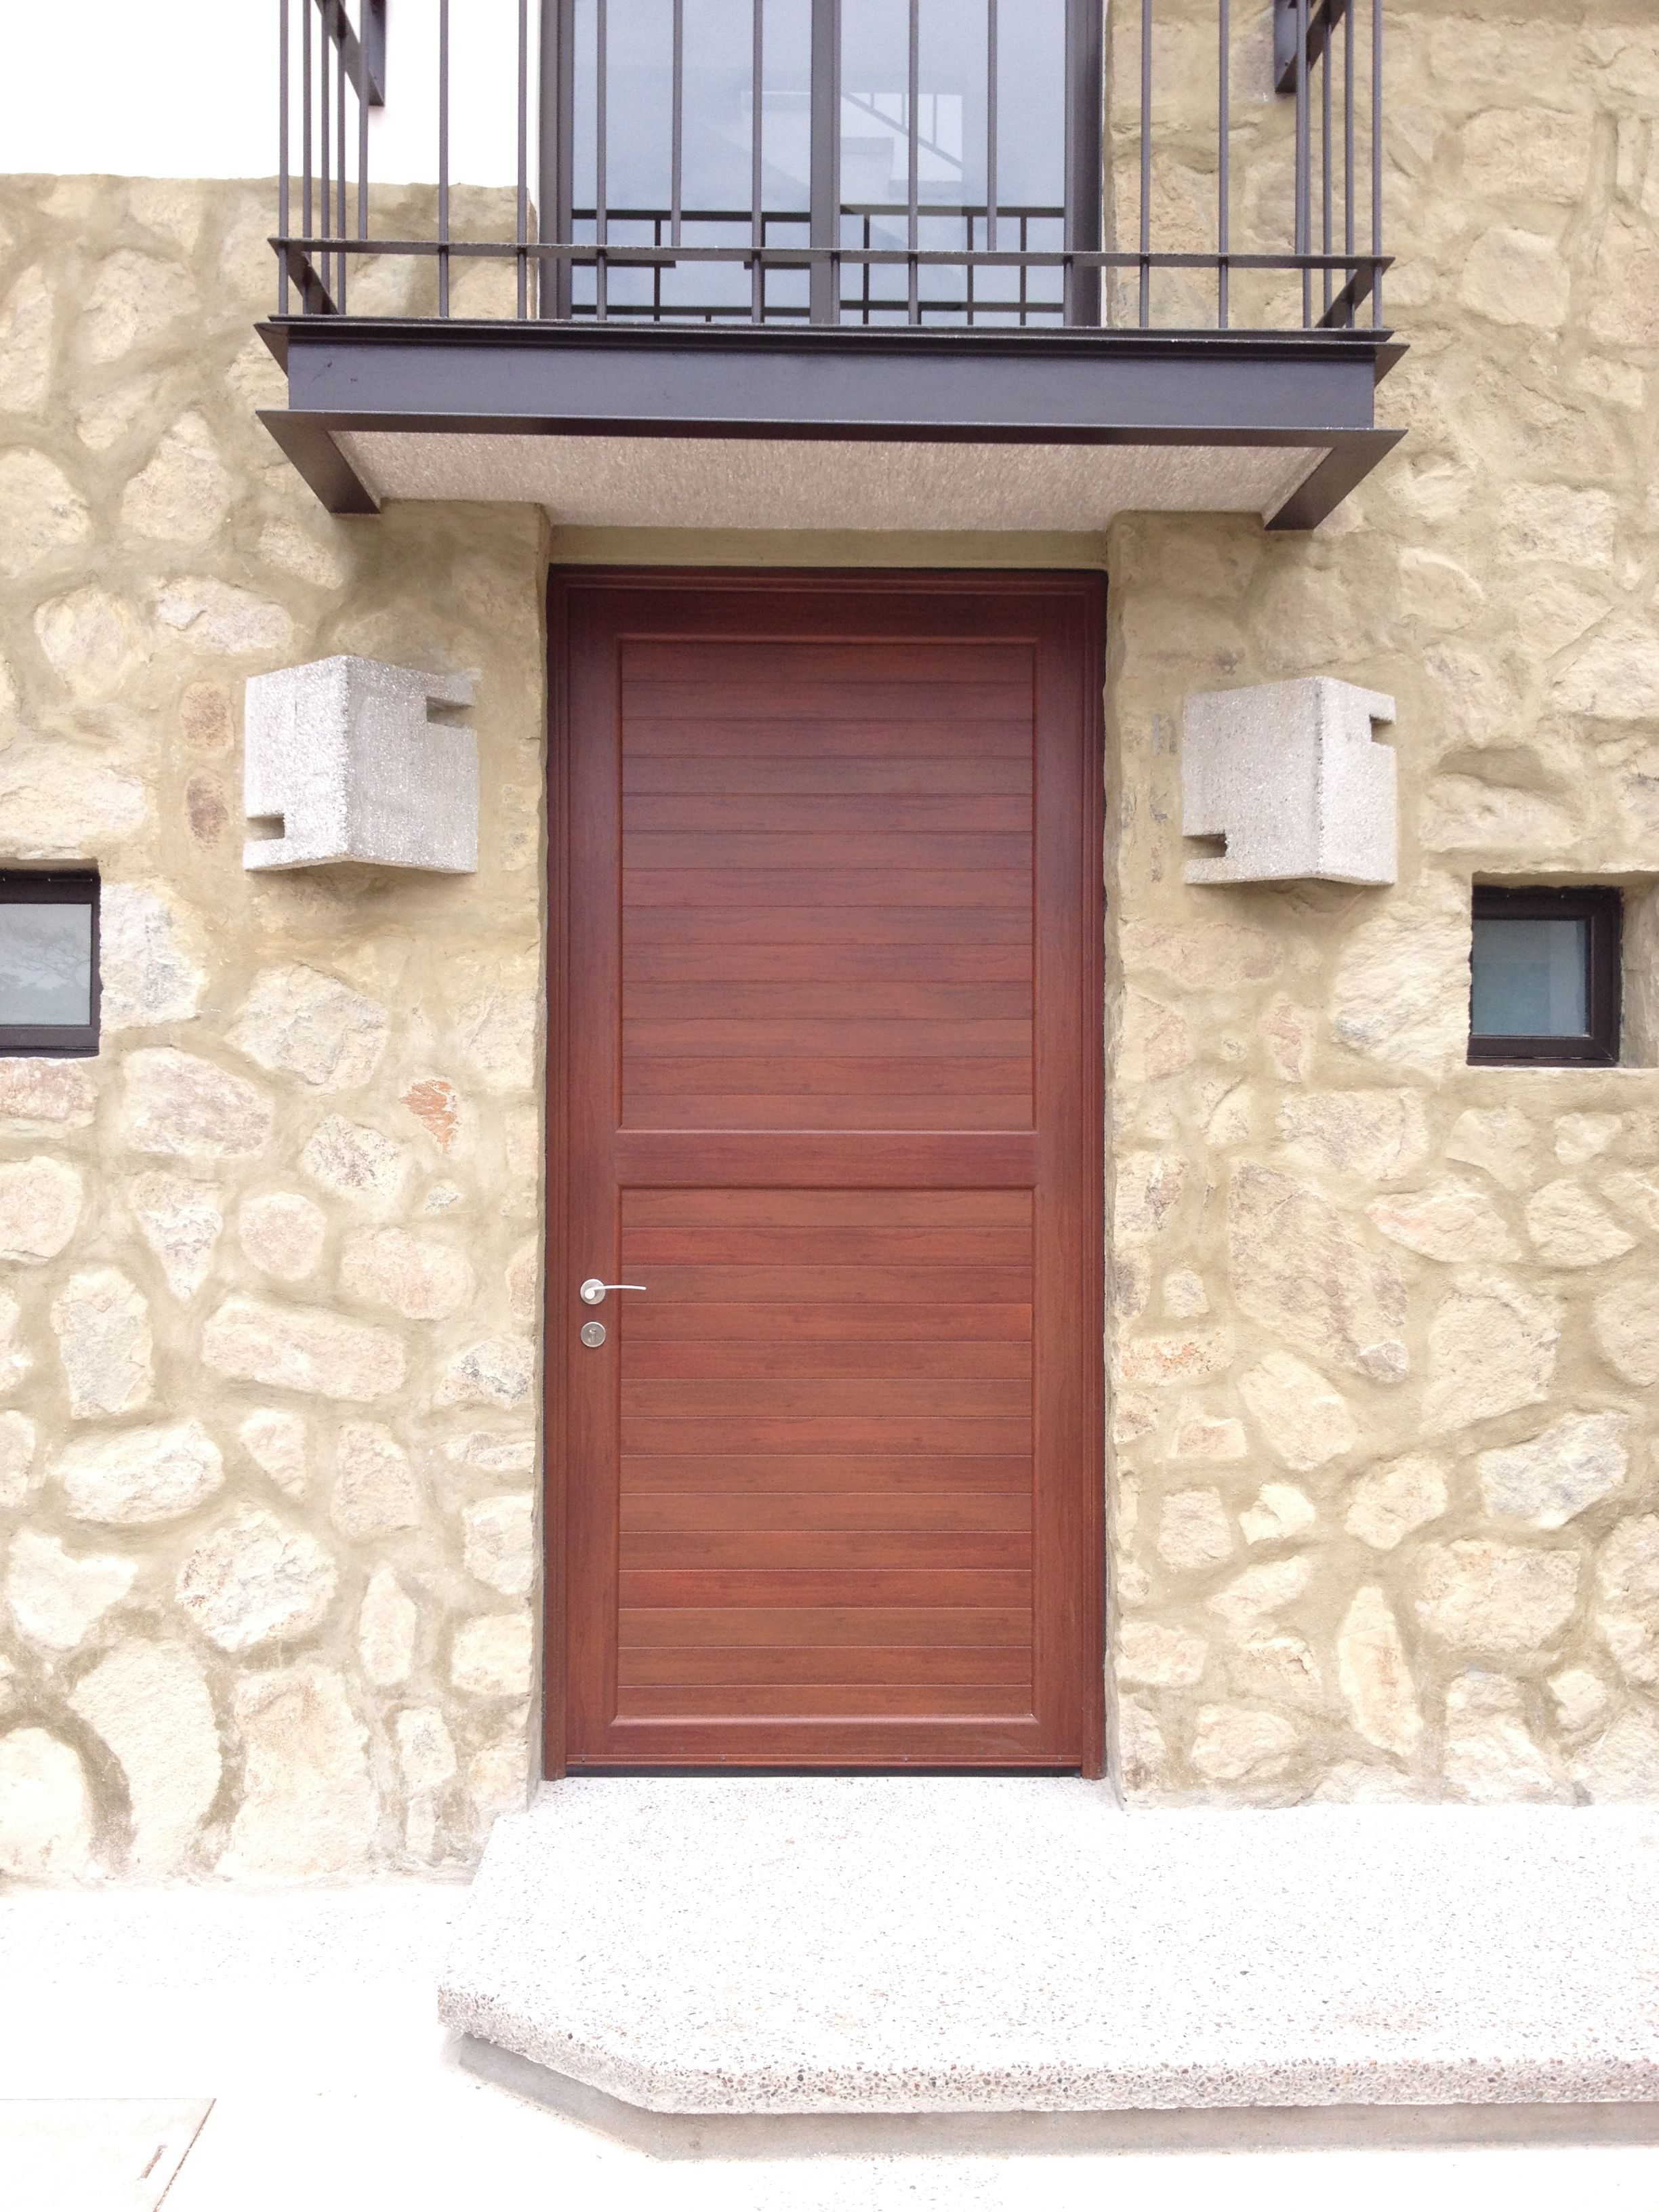 Puerta de aluminio color madera diferentes modelos for Puertas color madera